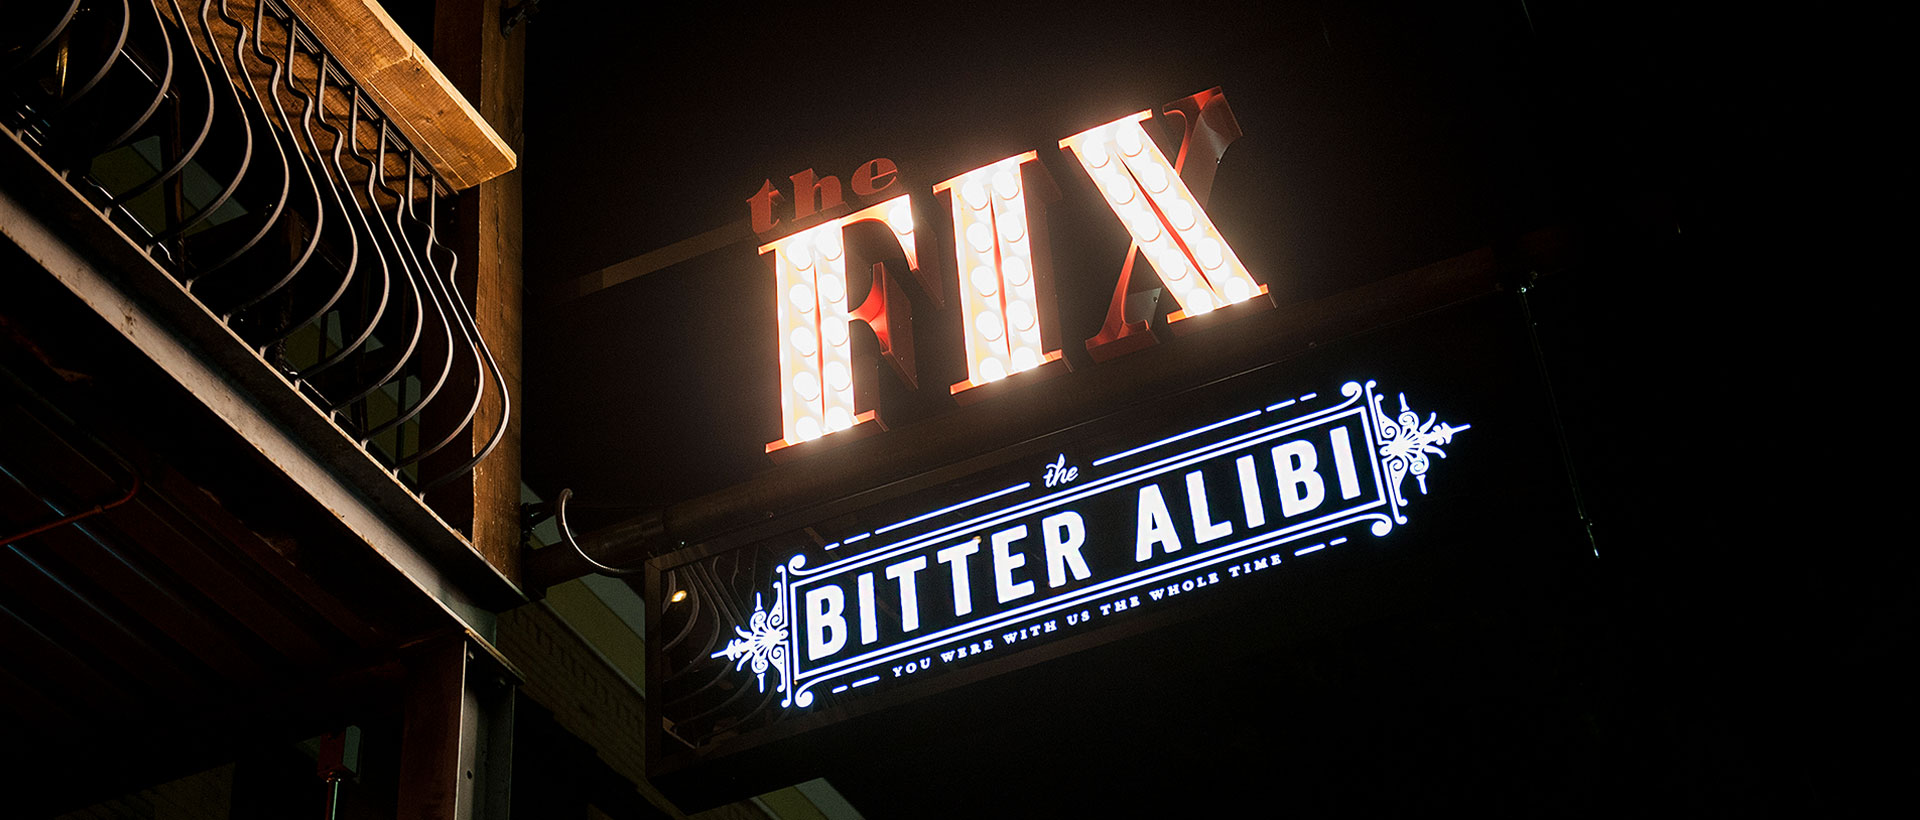 The Bitter Alibi / The Fix - Branding, Identity, Logos, Signage, Signs